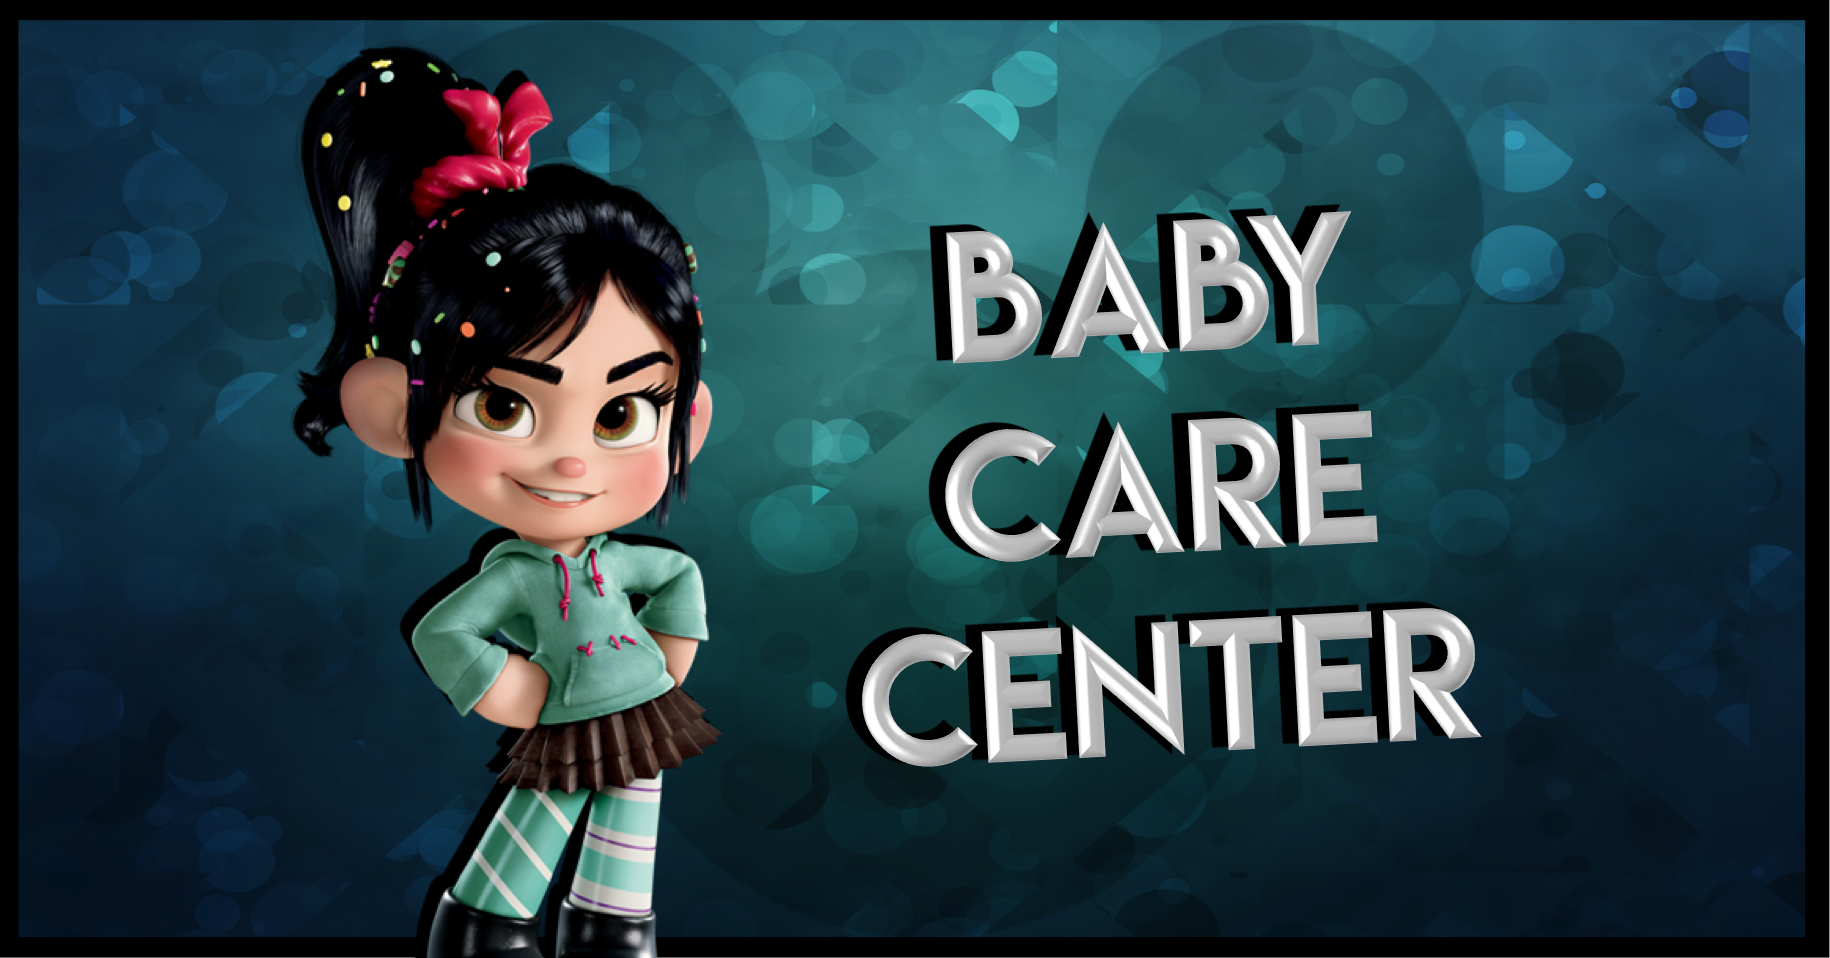 BABYCARECENTER.png